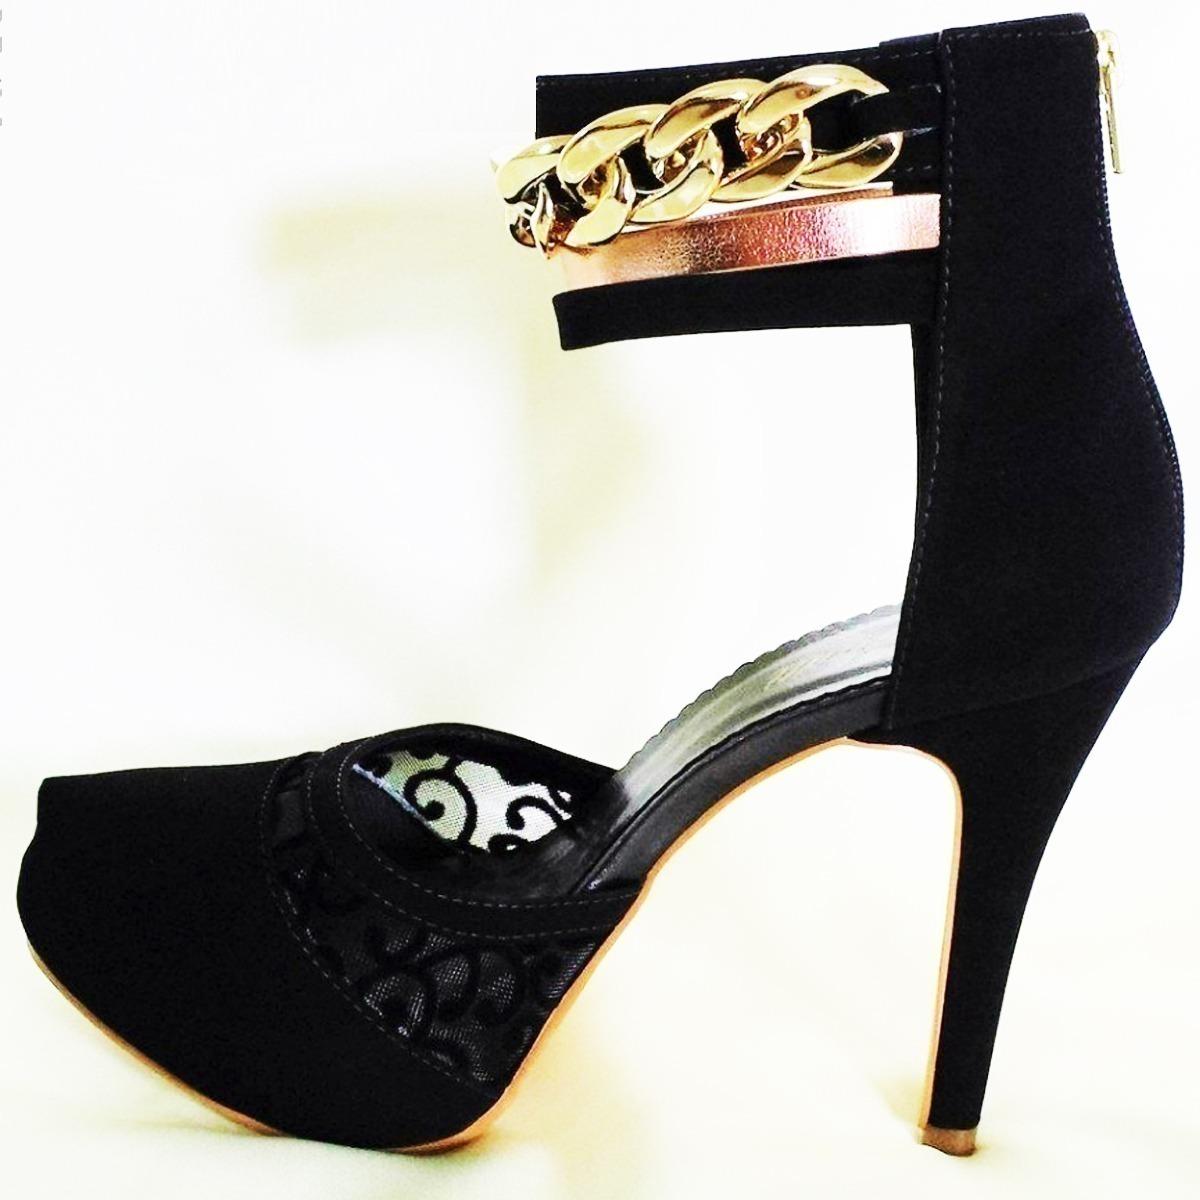 d3e7f78b200 sandália feminina sapato 46 scarpin salto alto preto salto. Carregando zoom.